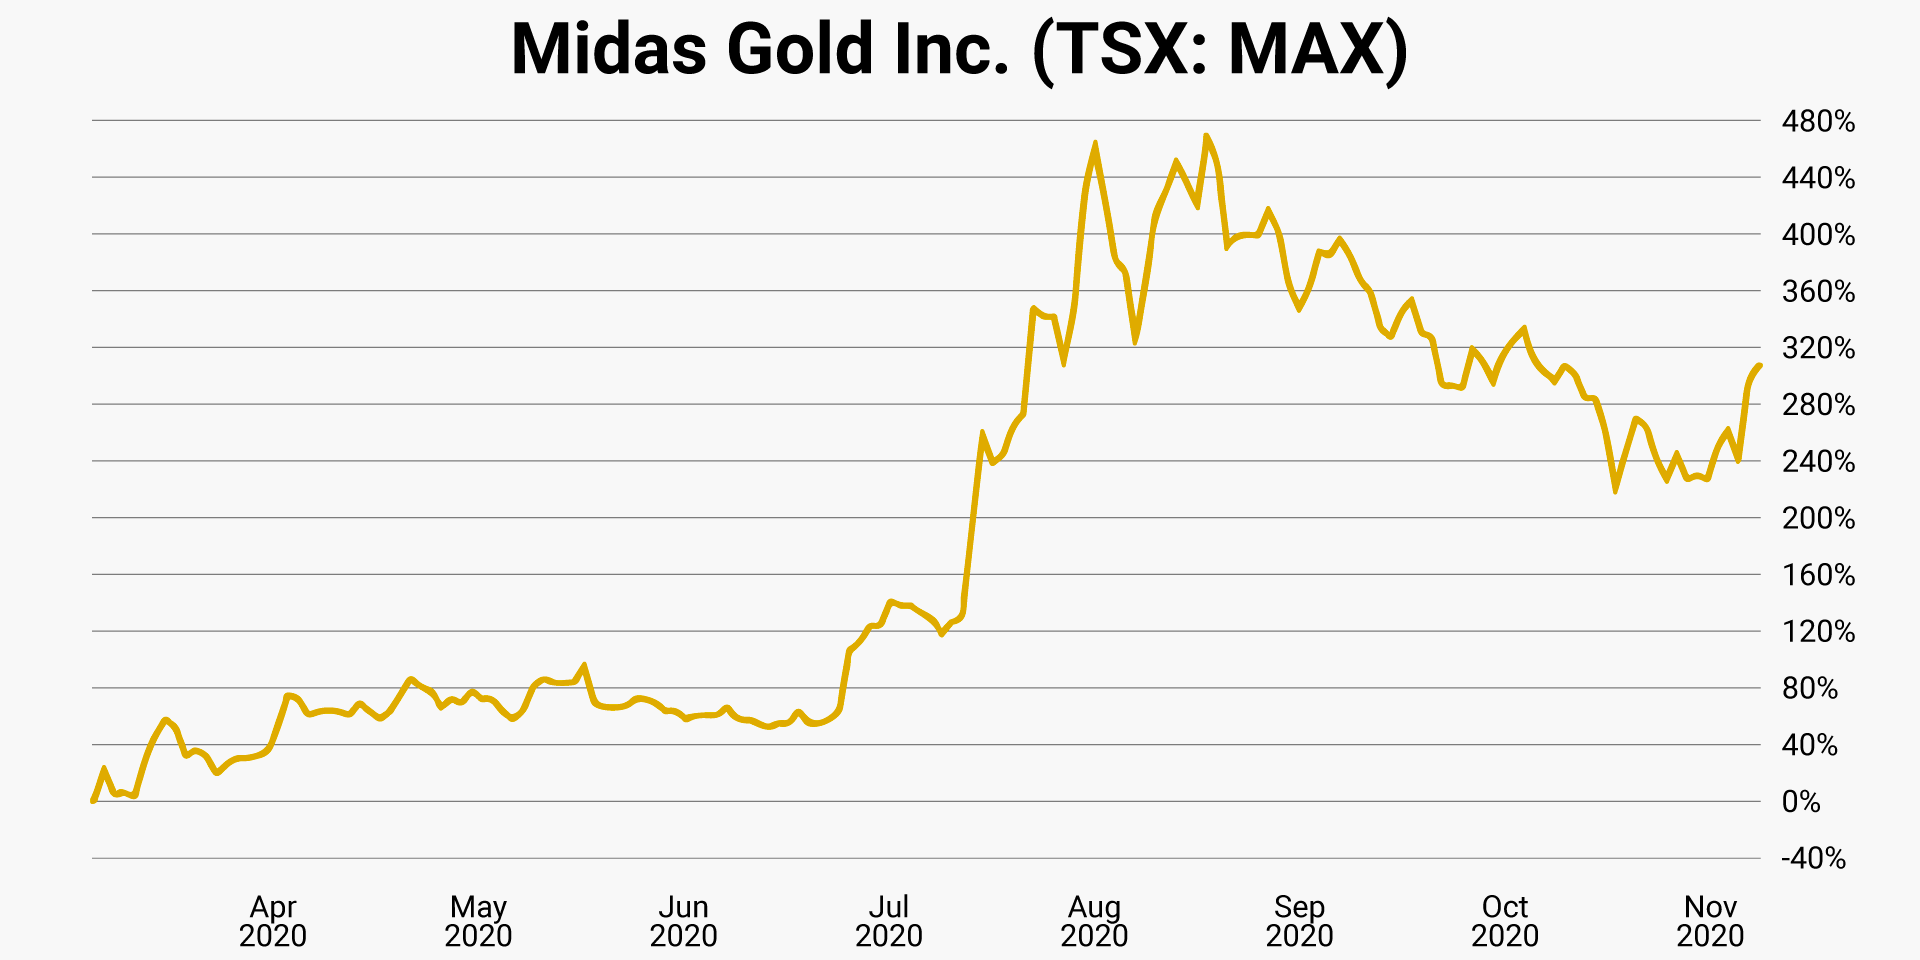 midas-gold-tsx-max